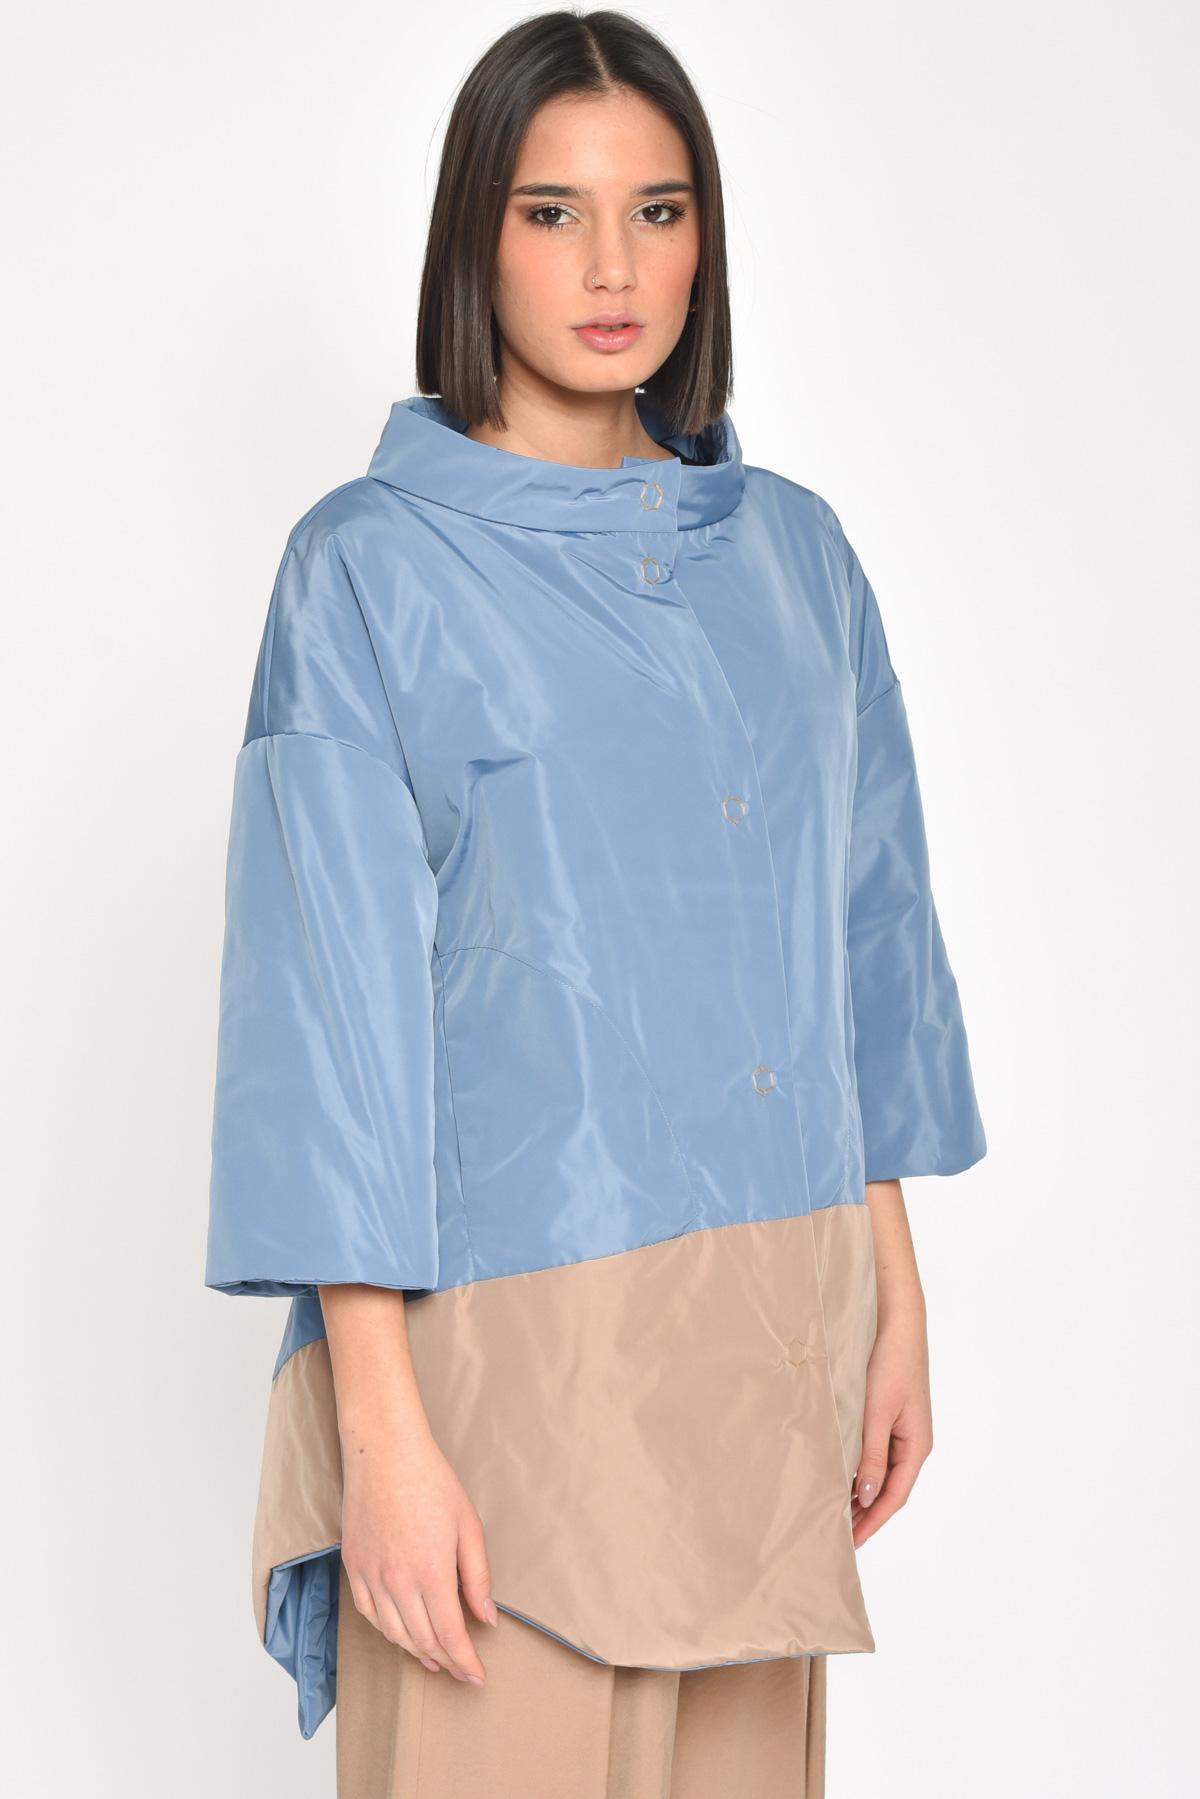 GIACCA OVER  BICOLORE for women - AVIO - Paquito Pronto Moda Shop Online